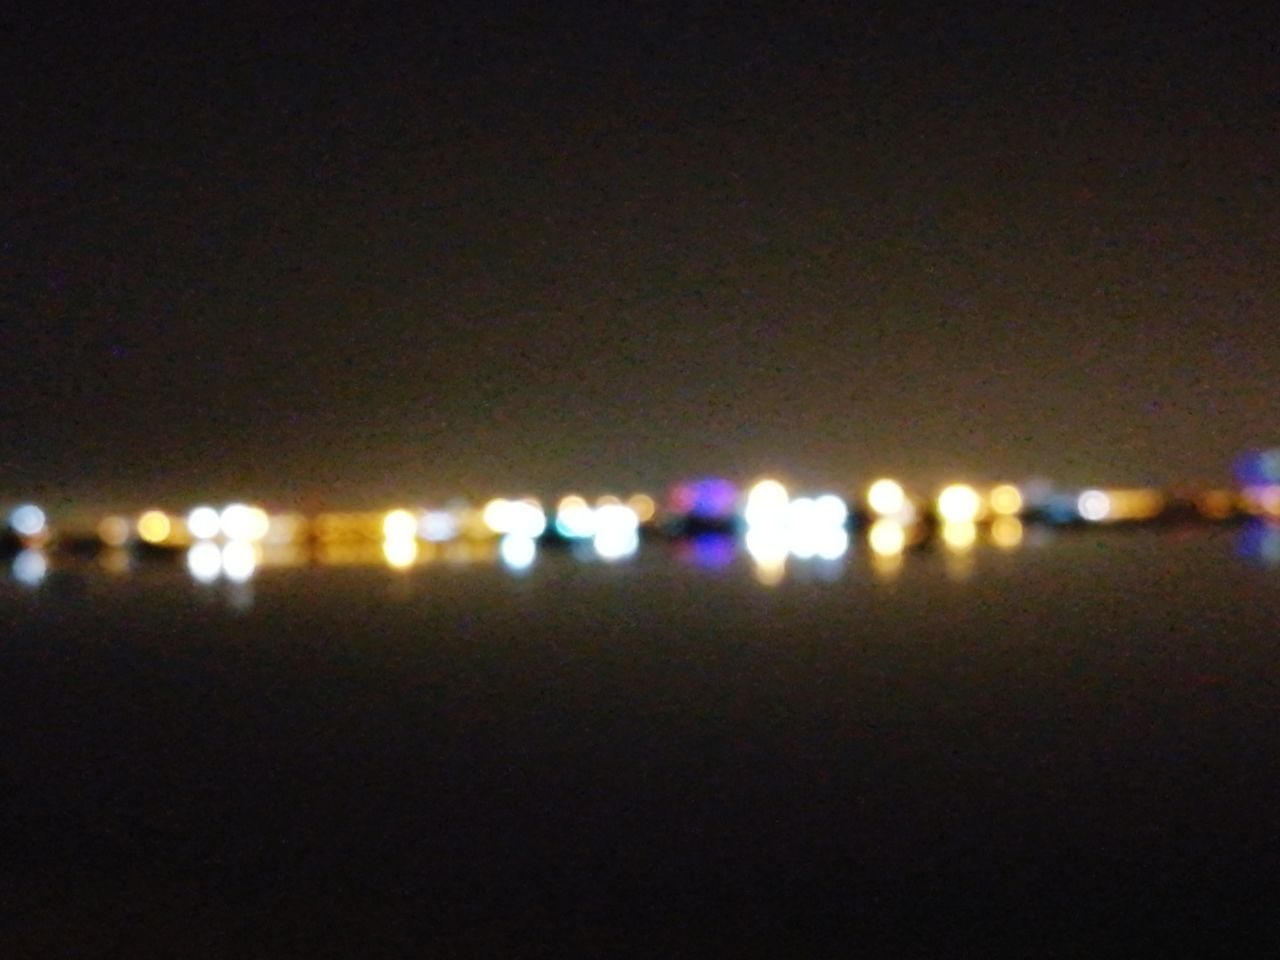 illuminated, glowing, burning, night, flame, no people, defocused, indoors, close-up, luminosity, diya - oil lamp, sky